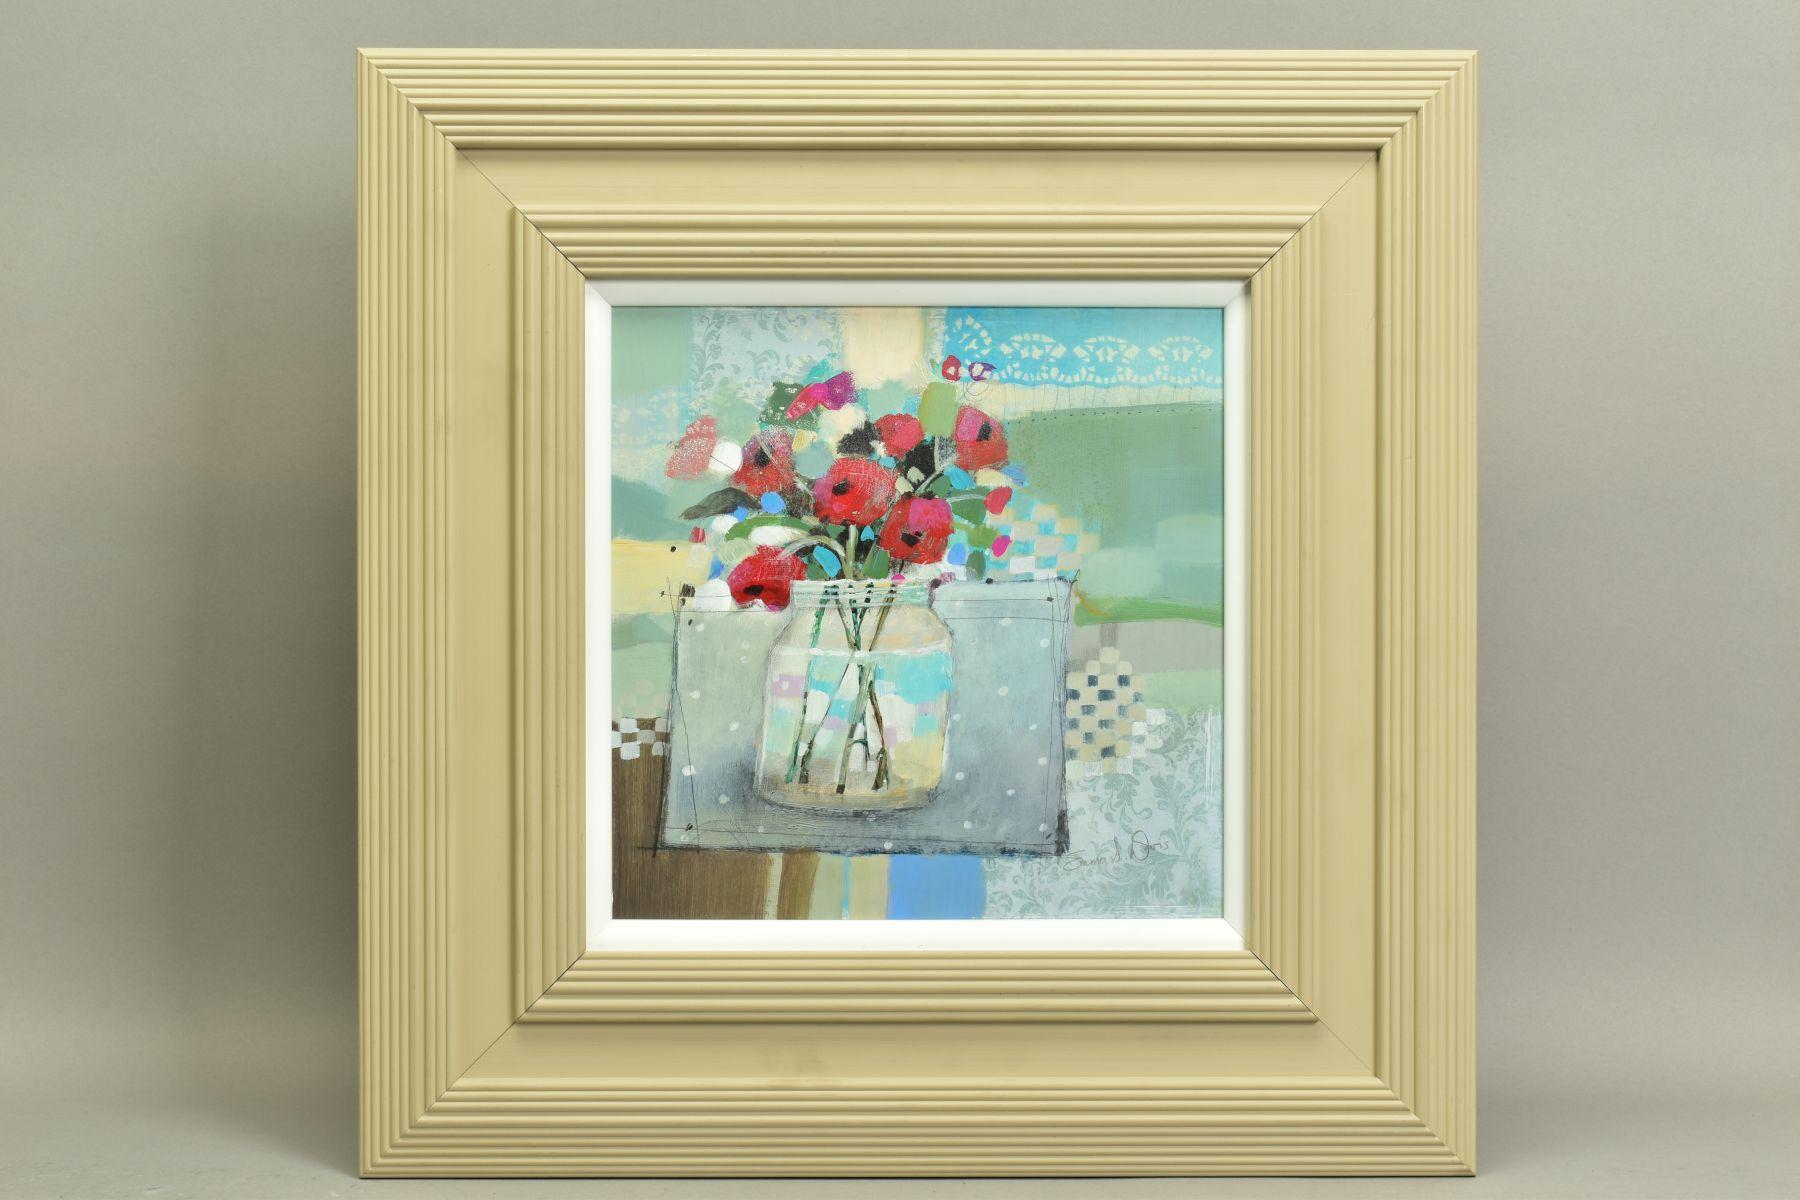 EMMA S. DAVIS (SCOTTISH 1975), 'Poppies in a Jar', a still life study of wild flowers, signed bottom